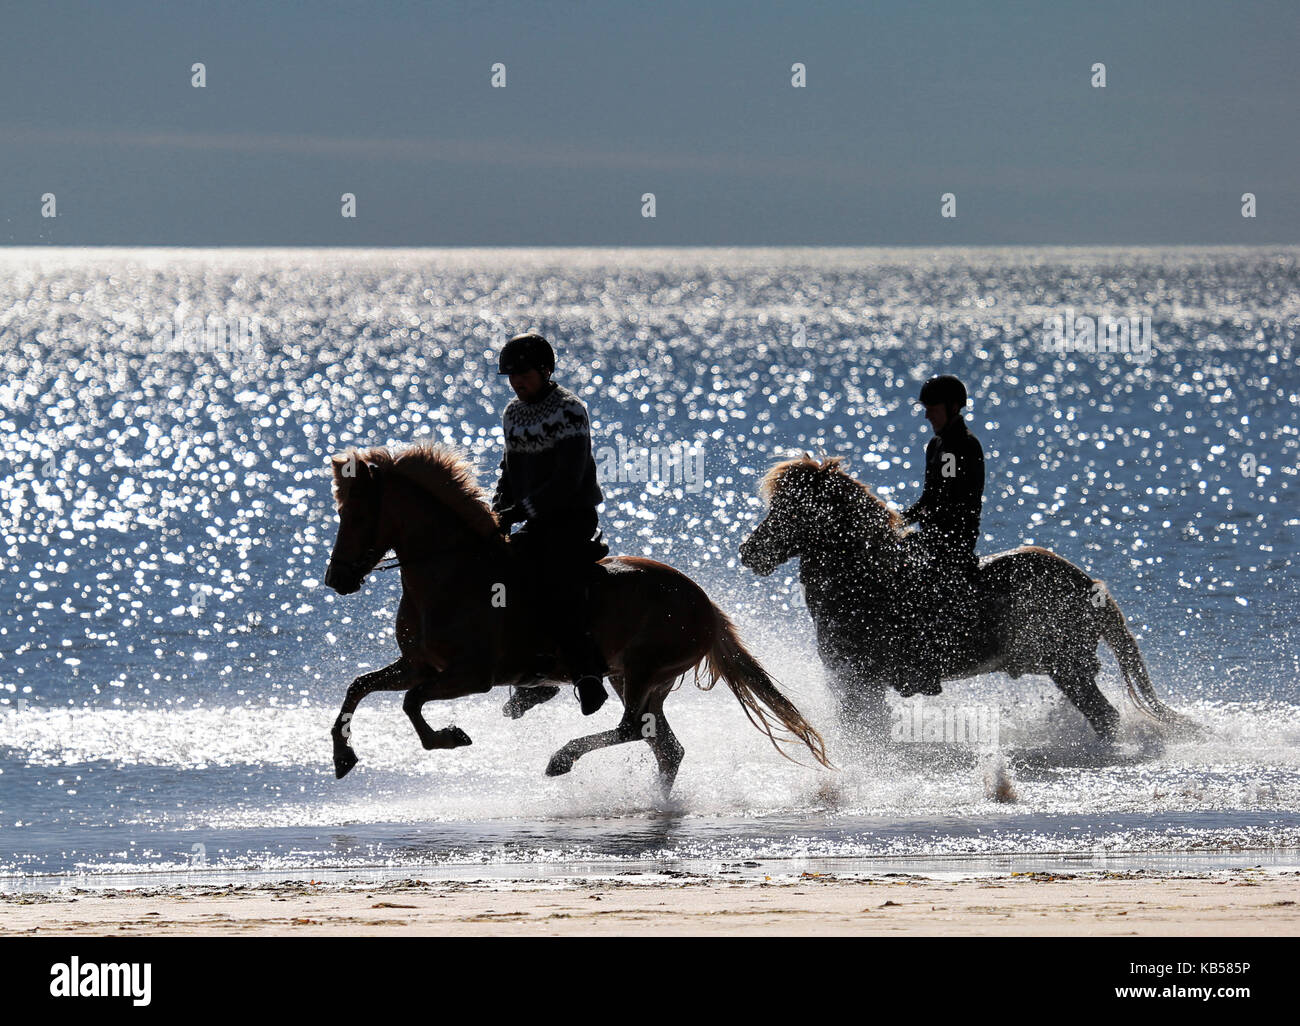 L'équitation sur longufjorur Beach, péninsule de snæfellsnes, l'islande Photo Stock